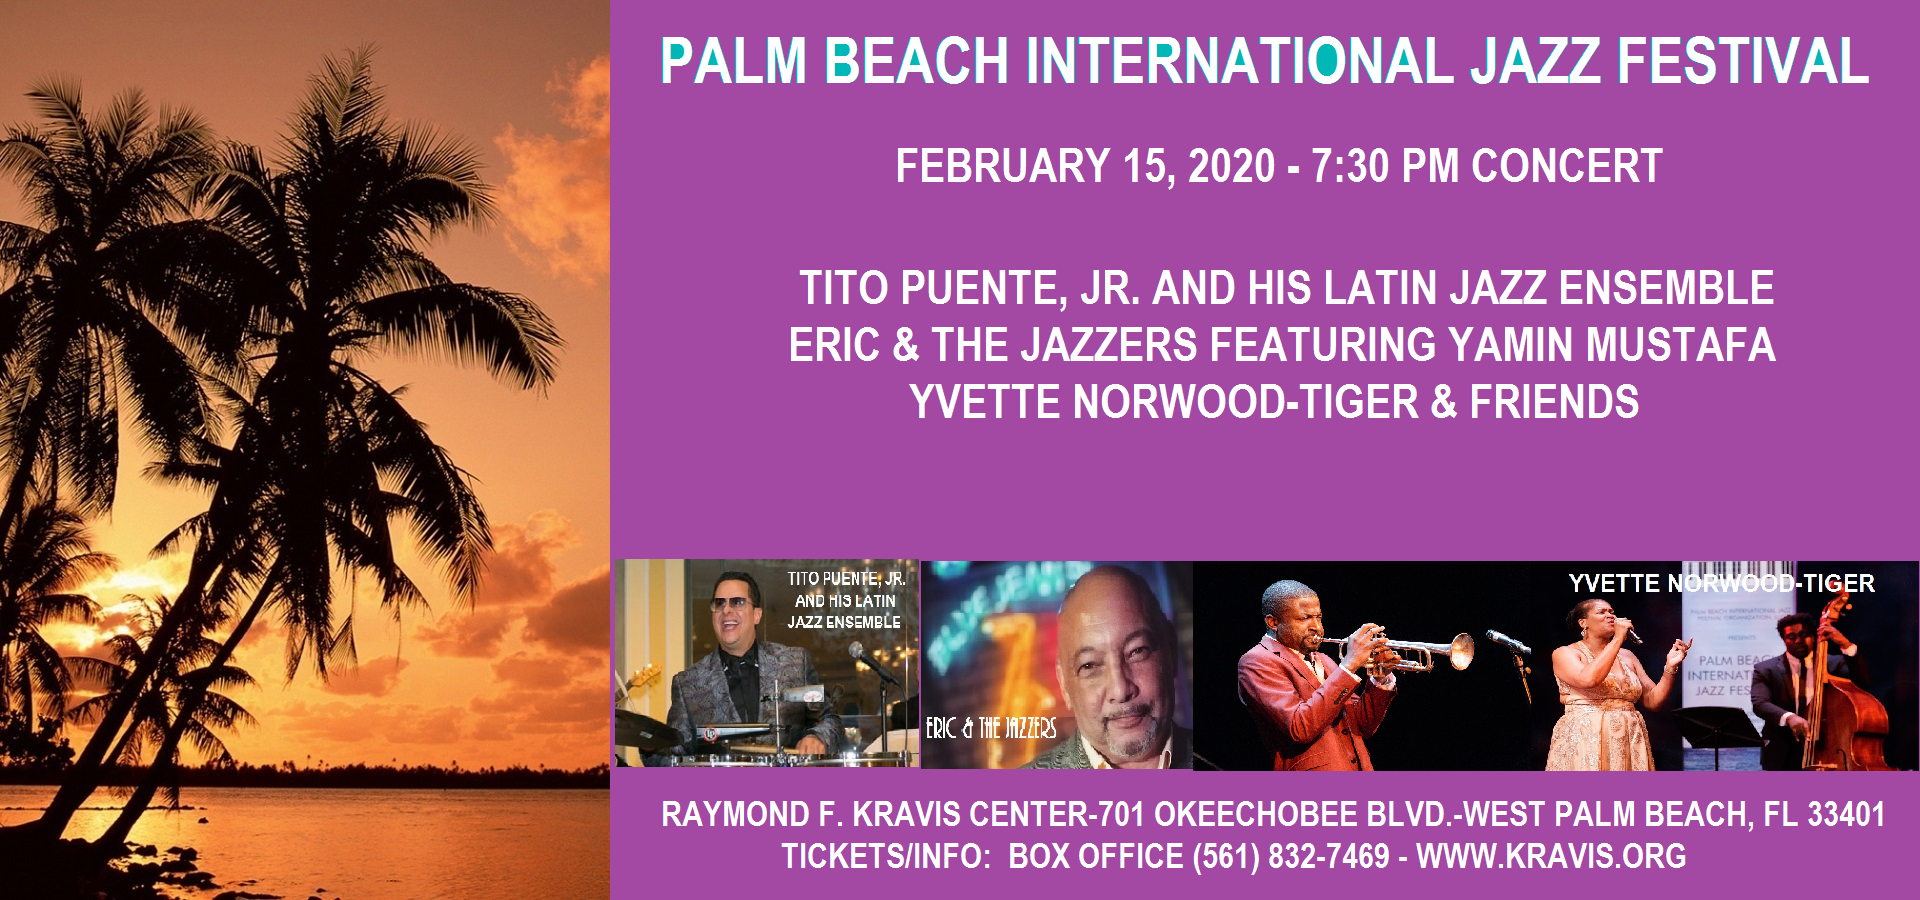 2nd Annual Palm Beach International Jazz Festival